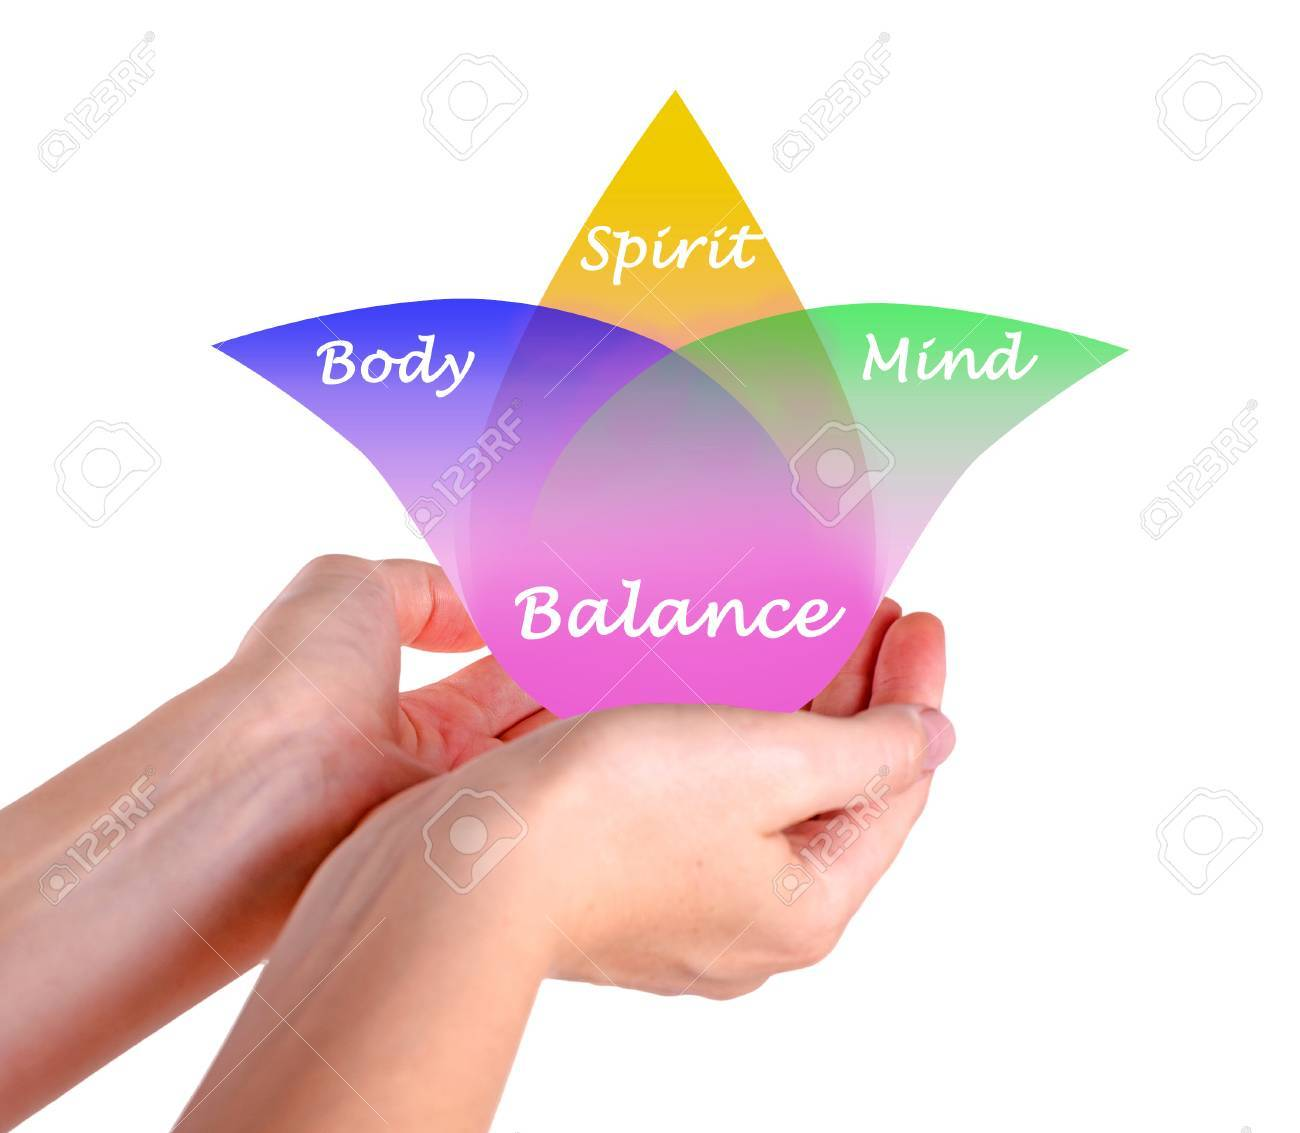 Body, spirit, mind Balance Stock Photo - 31680451